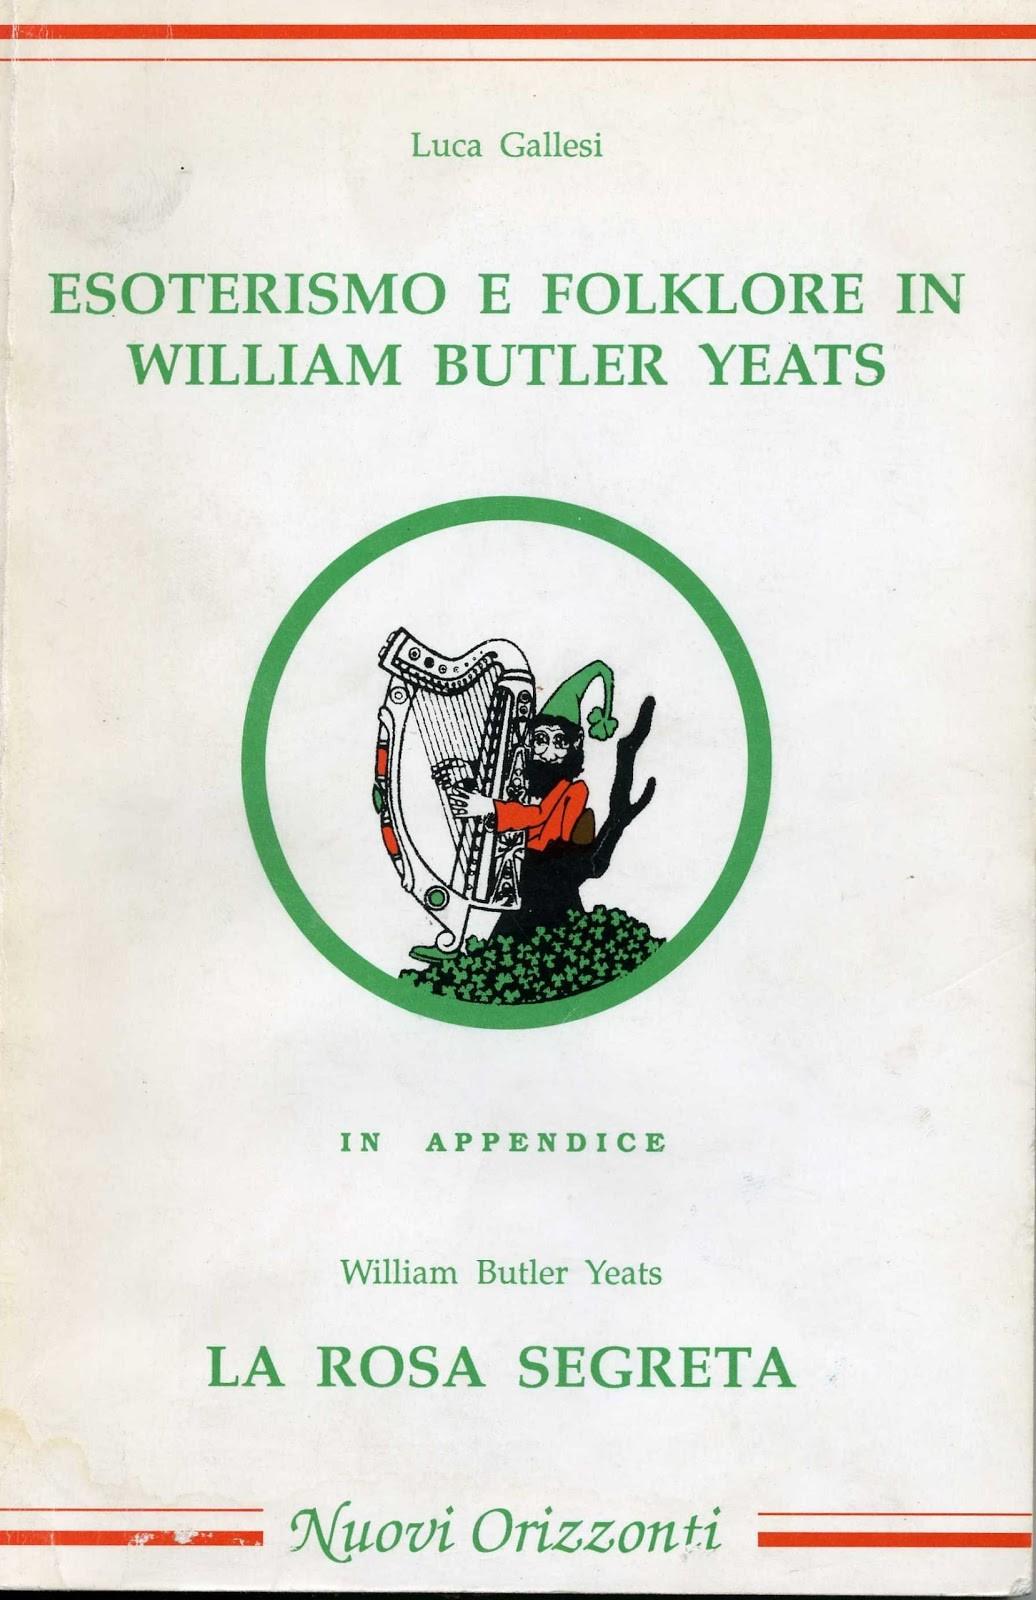 Esoterismo e folklore in William Butler Yeats